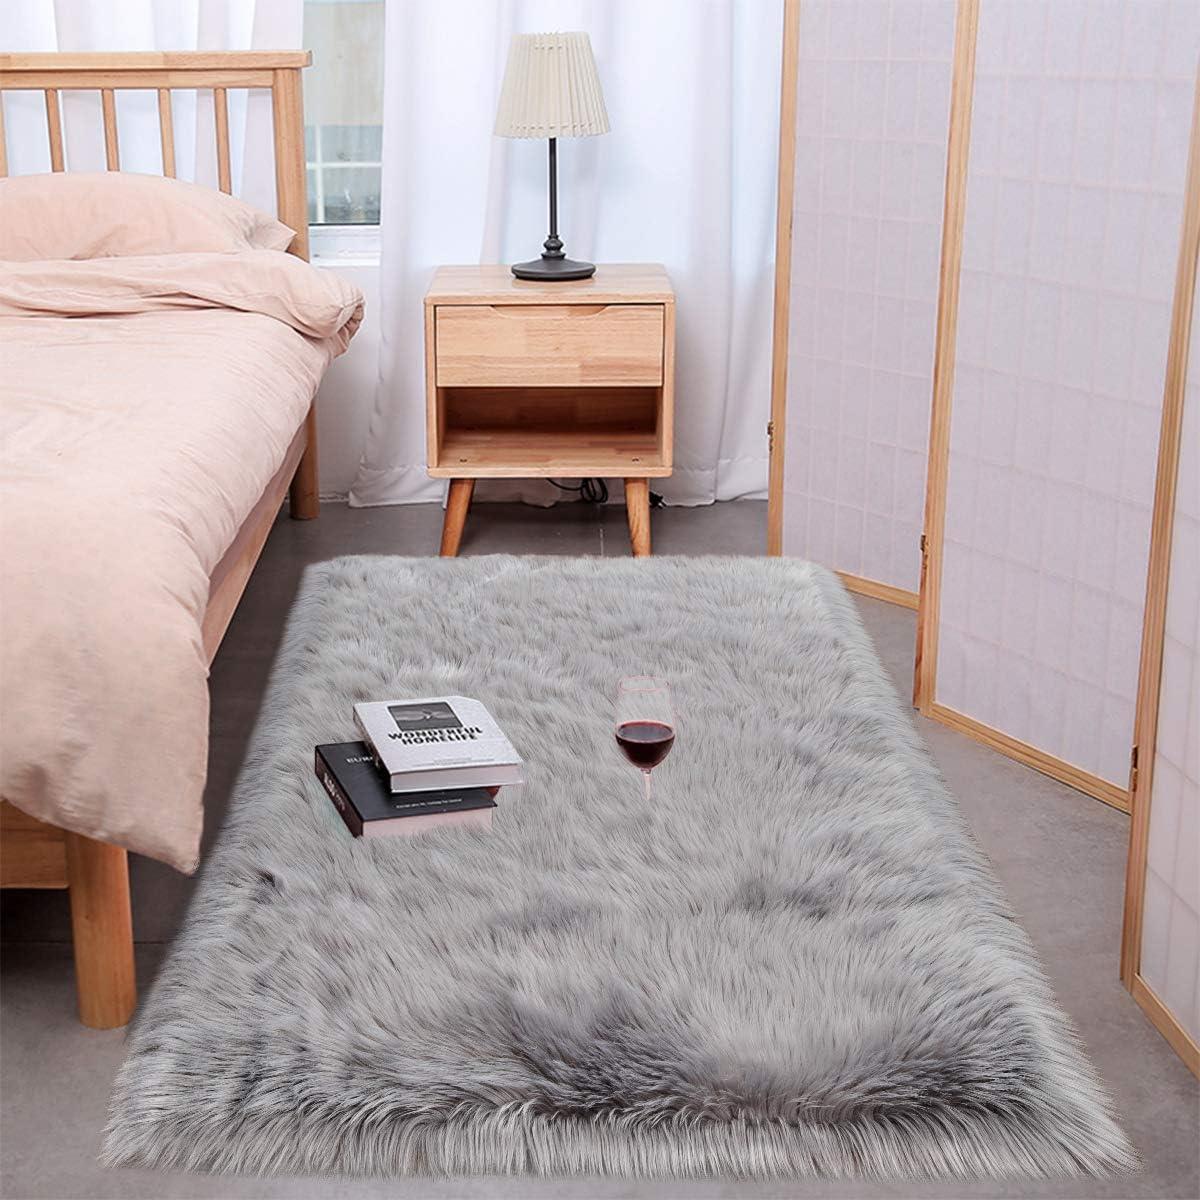 Wondo Soft Shag Faux Fur Sheepskin Area Rugs for Bedroom Home Decor Floor Sofa Couch Fluffy Carpet Chair Cover Cushion 2ft x 3ft,Grey